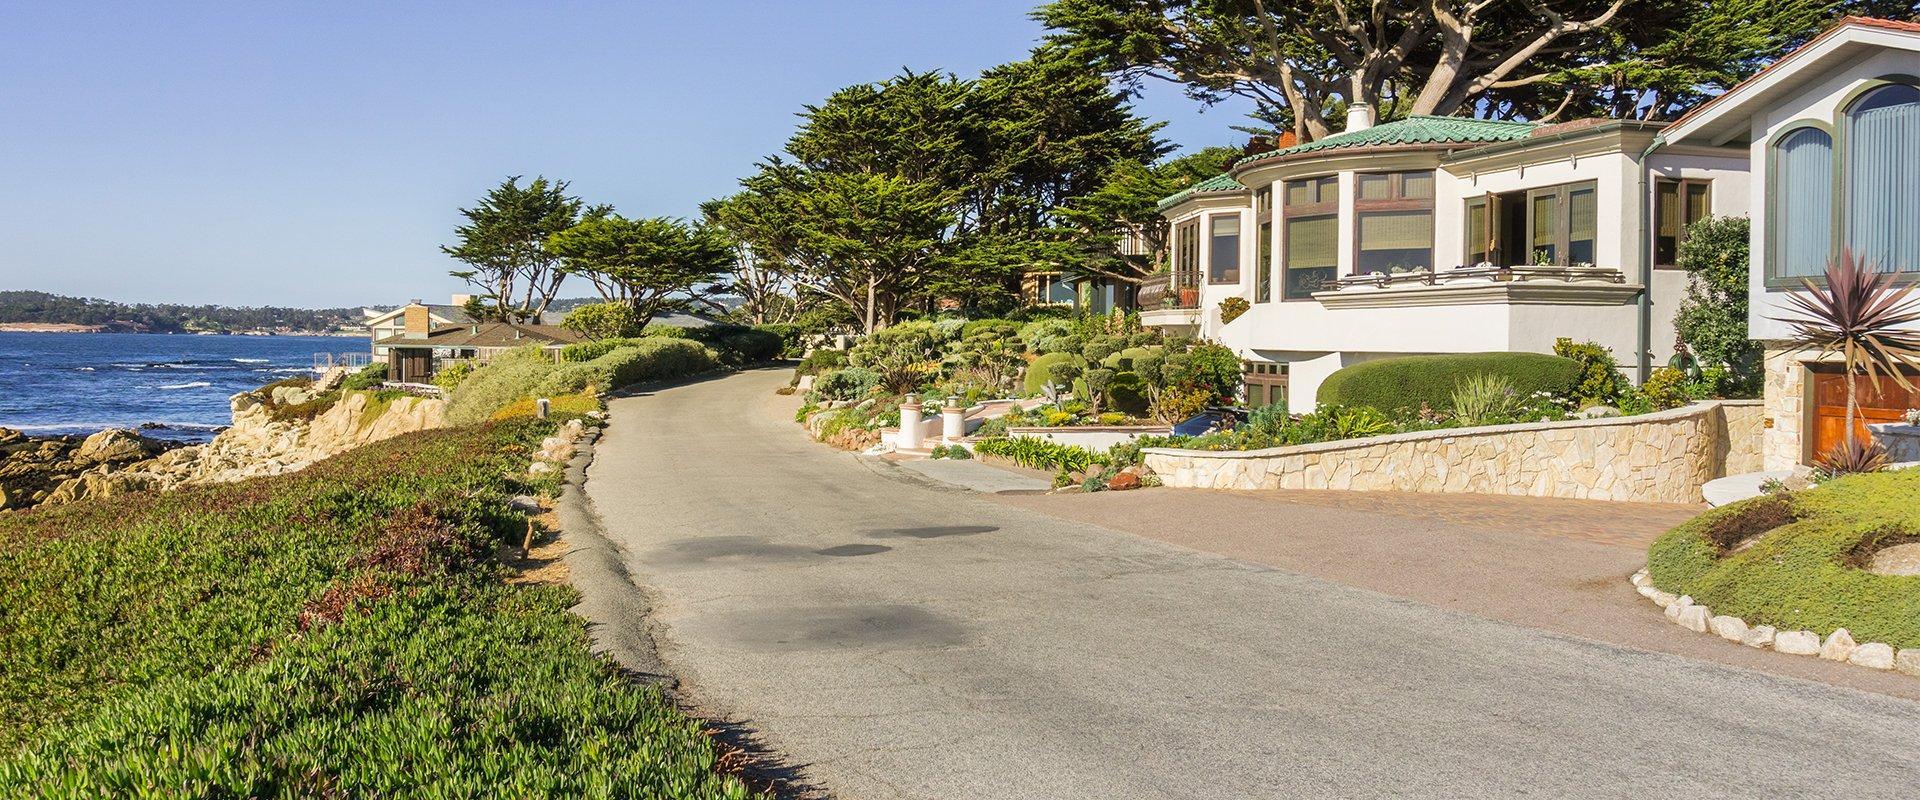 fancy home in san jose california